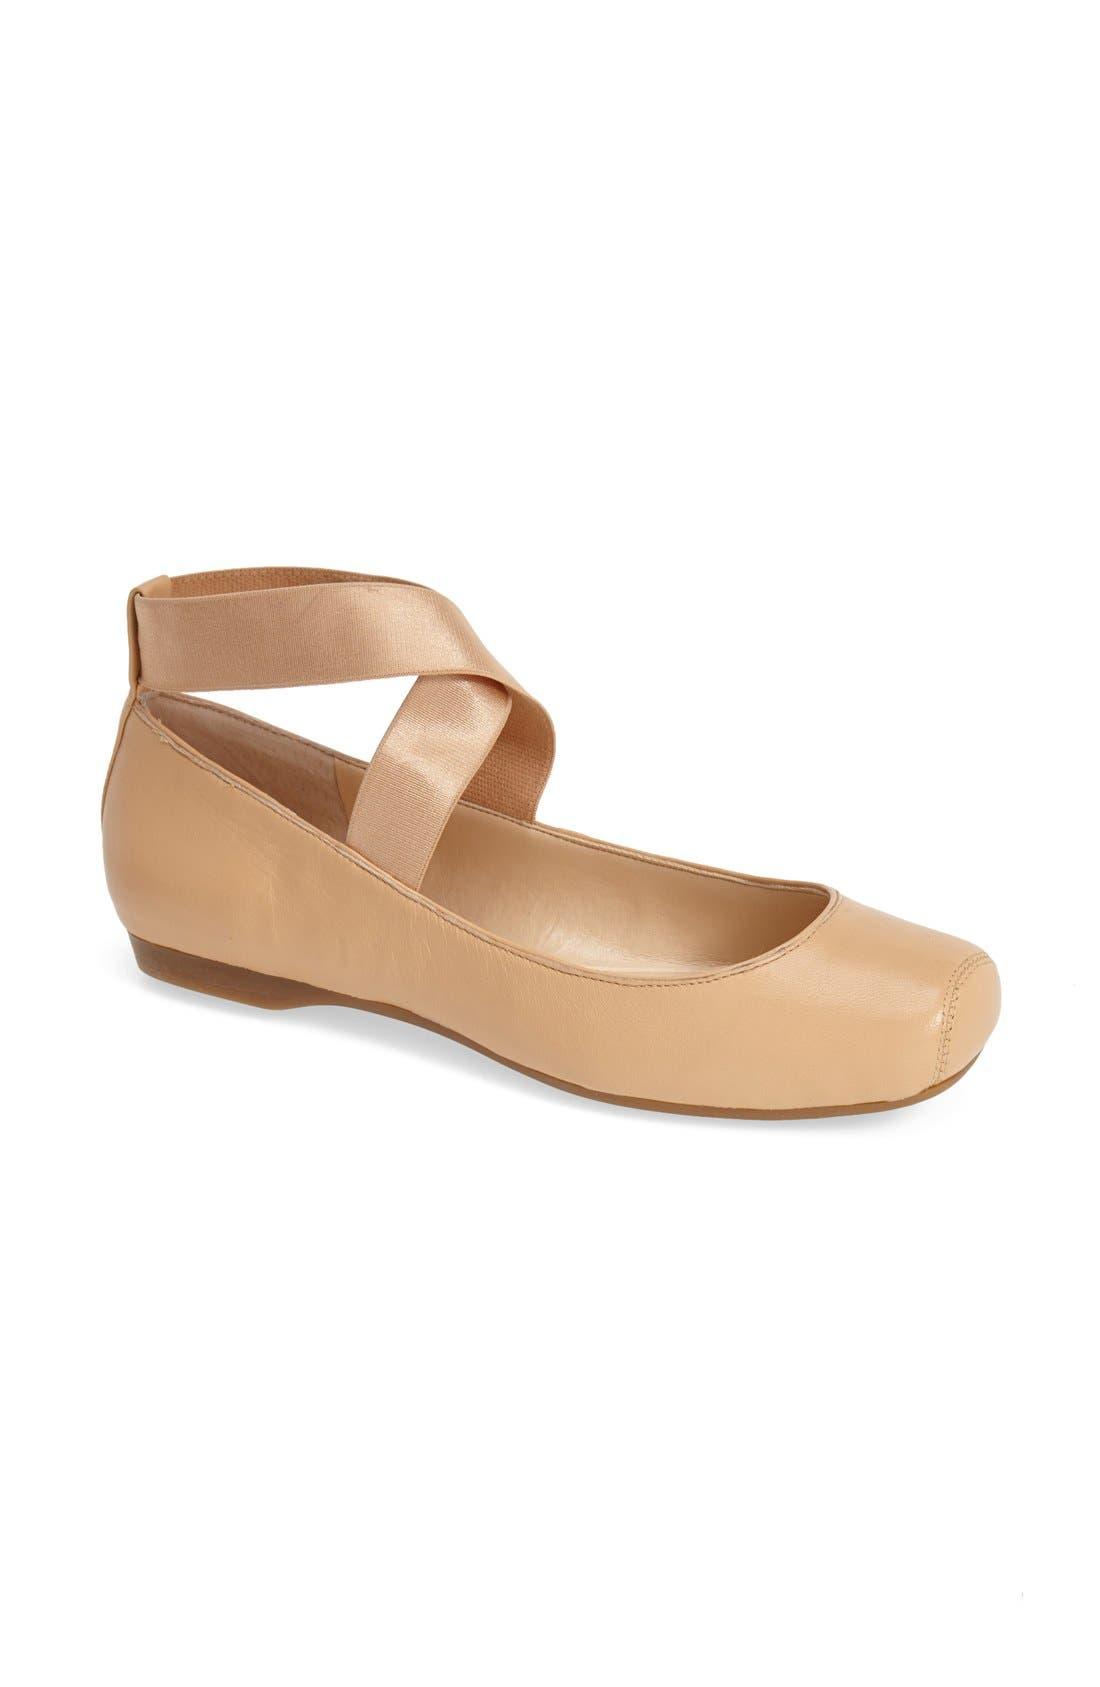 Alternate Image 1 Selected - Jessica Simpson 'Mandalaye' Leather Flat